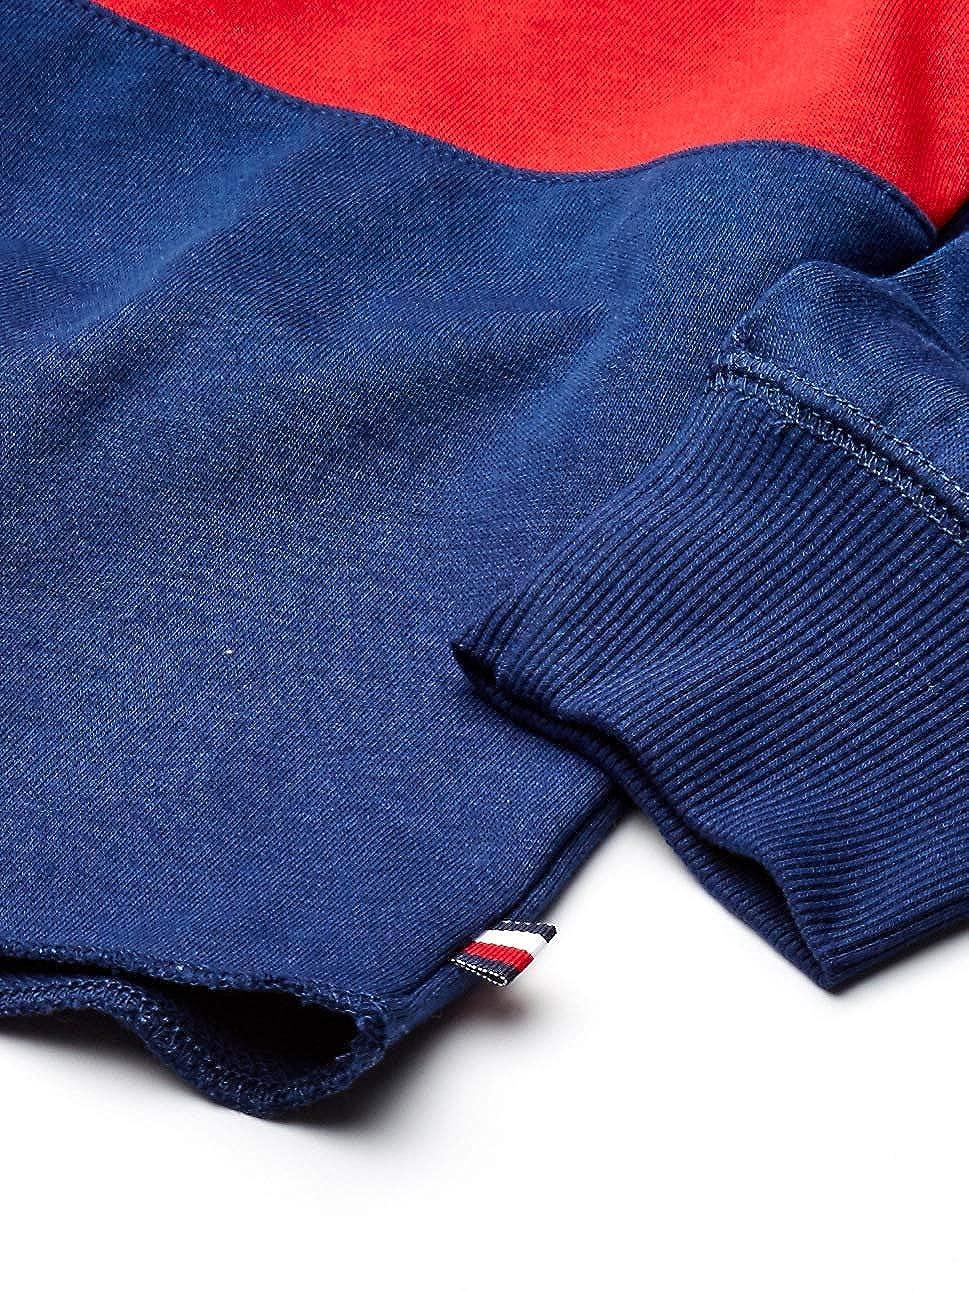 Tommy Hilfiger Girls Sport Pullover Sweater